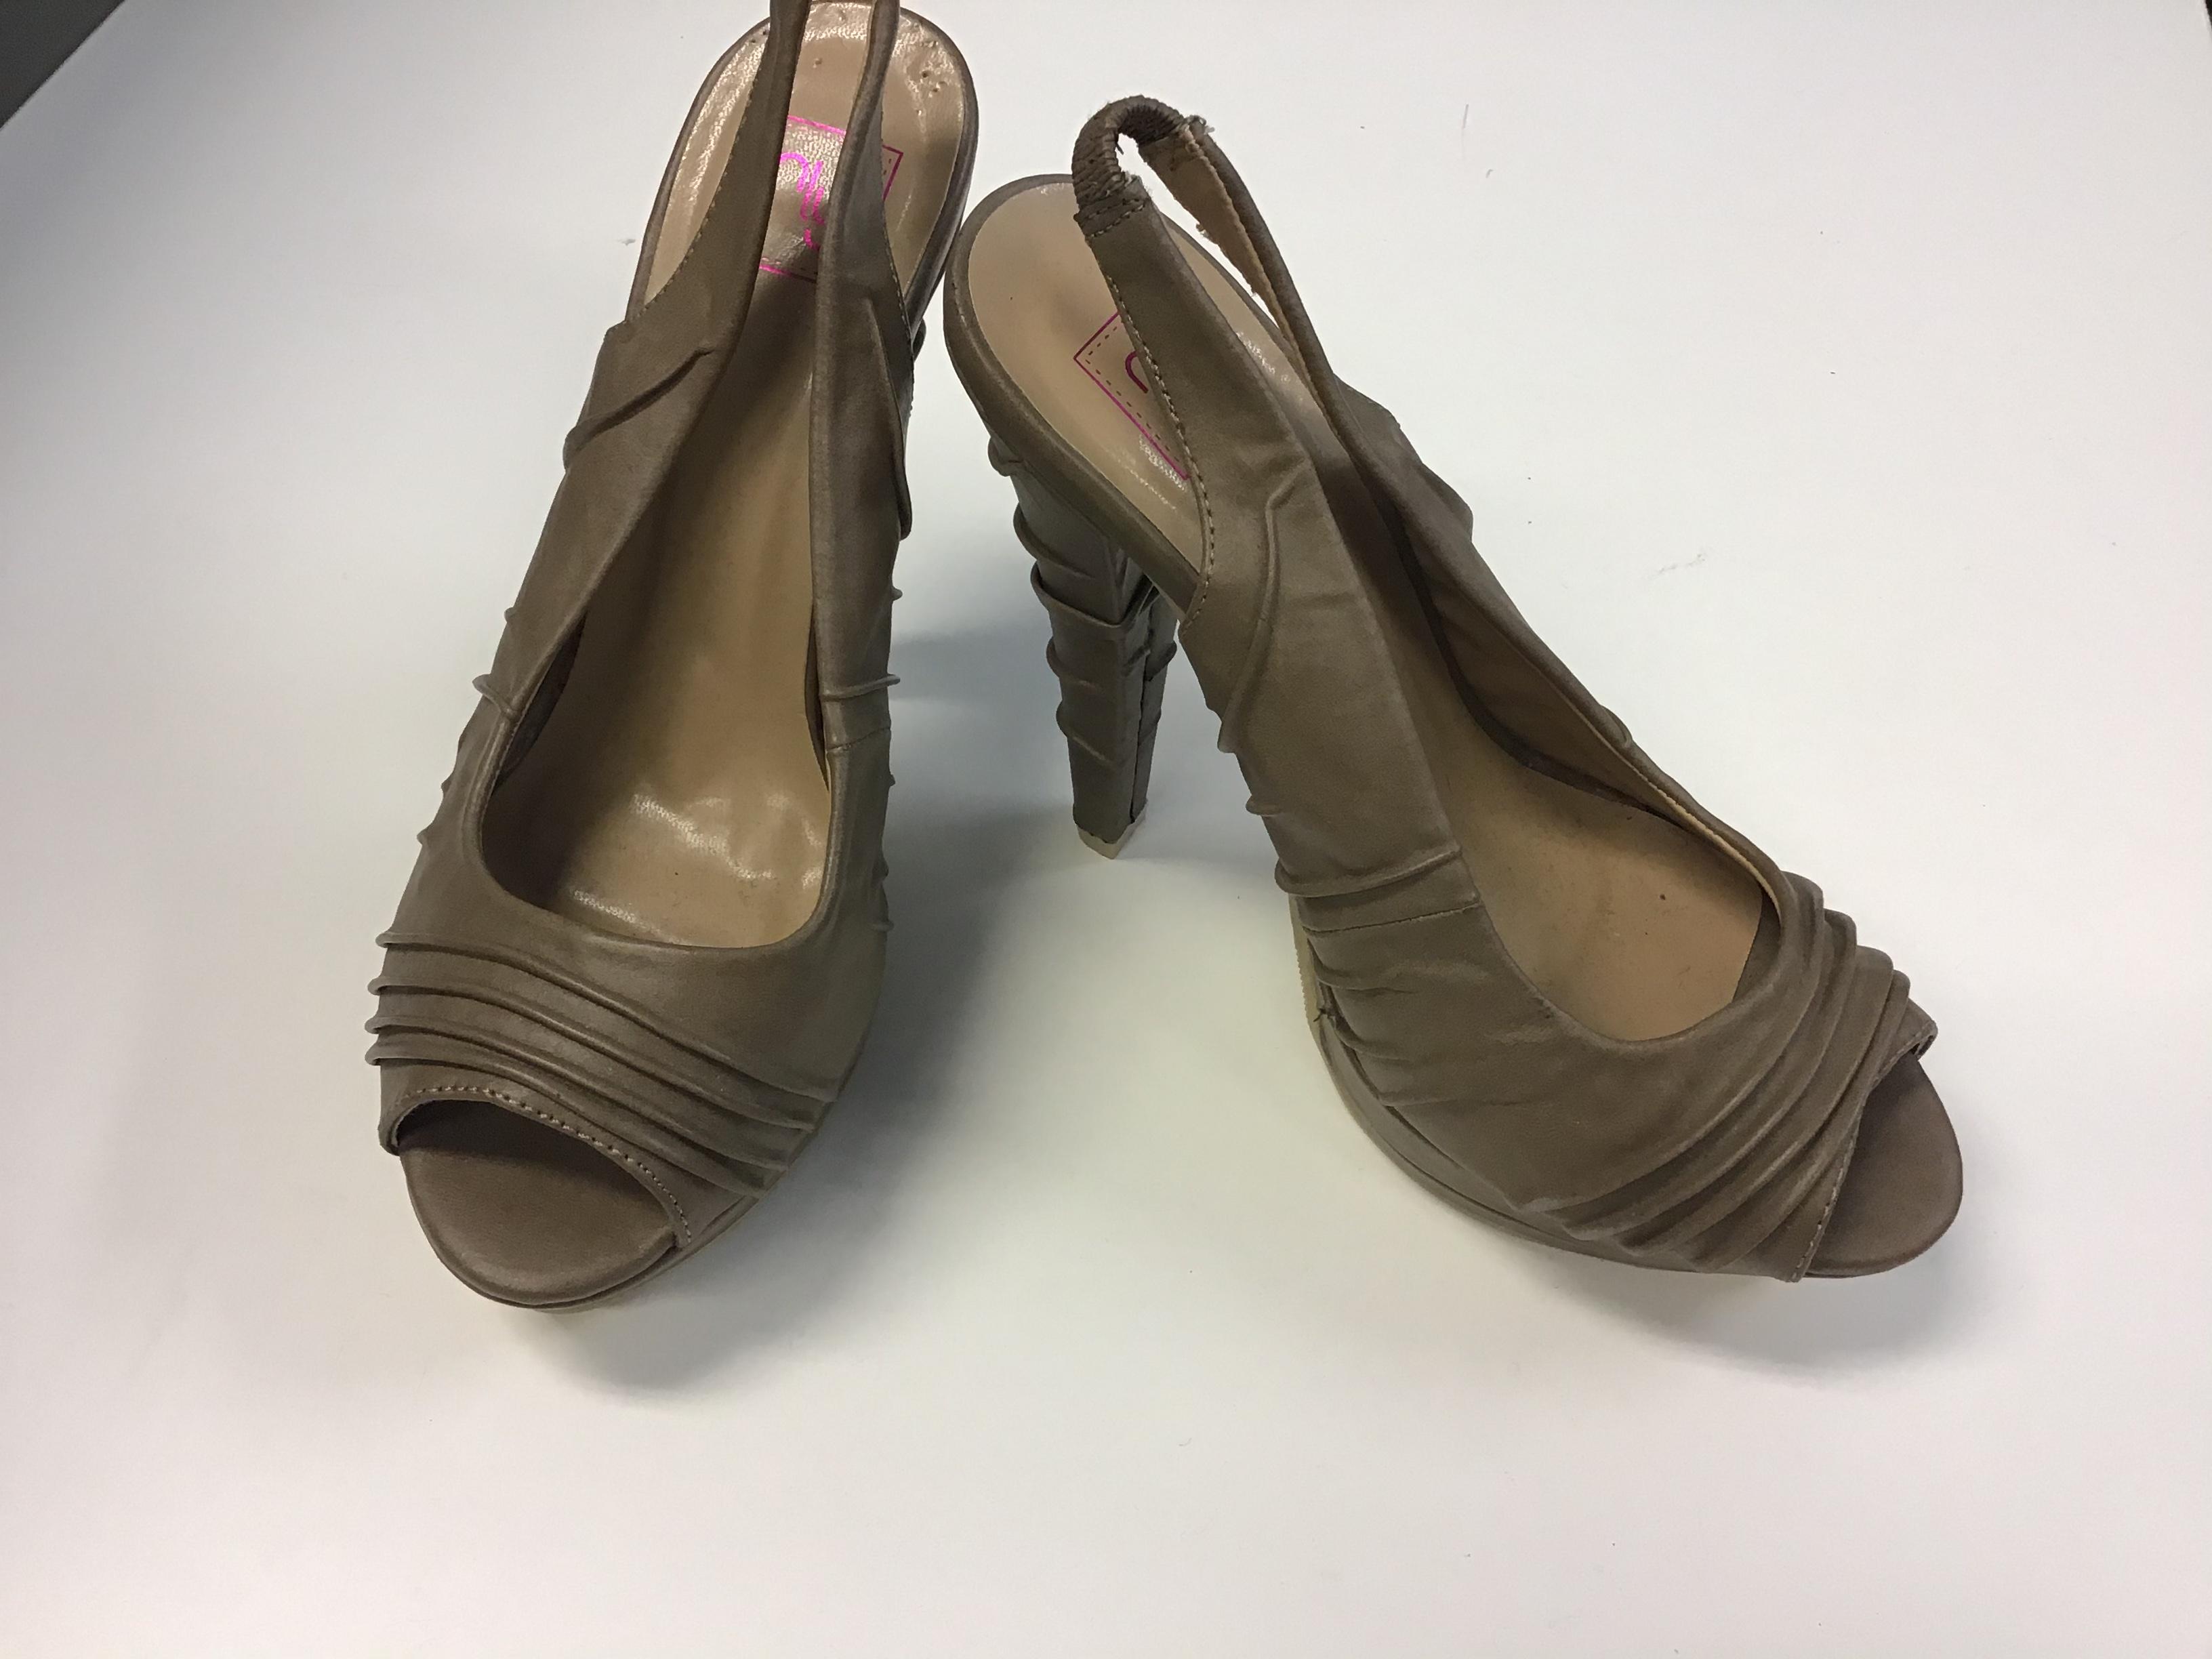 Kengät, NLY, uusi, koko 37